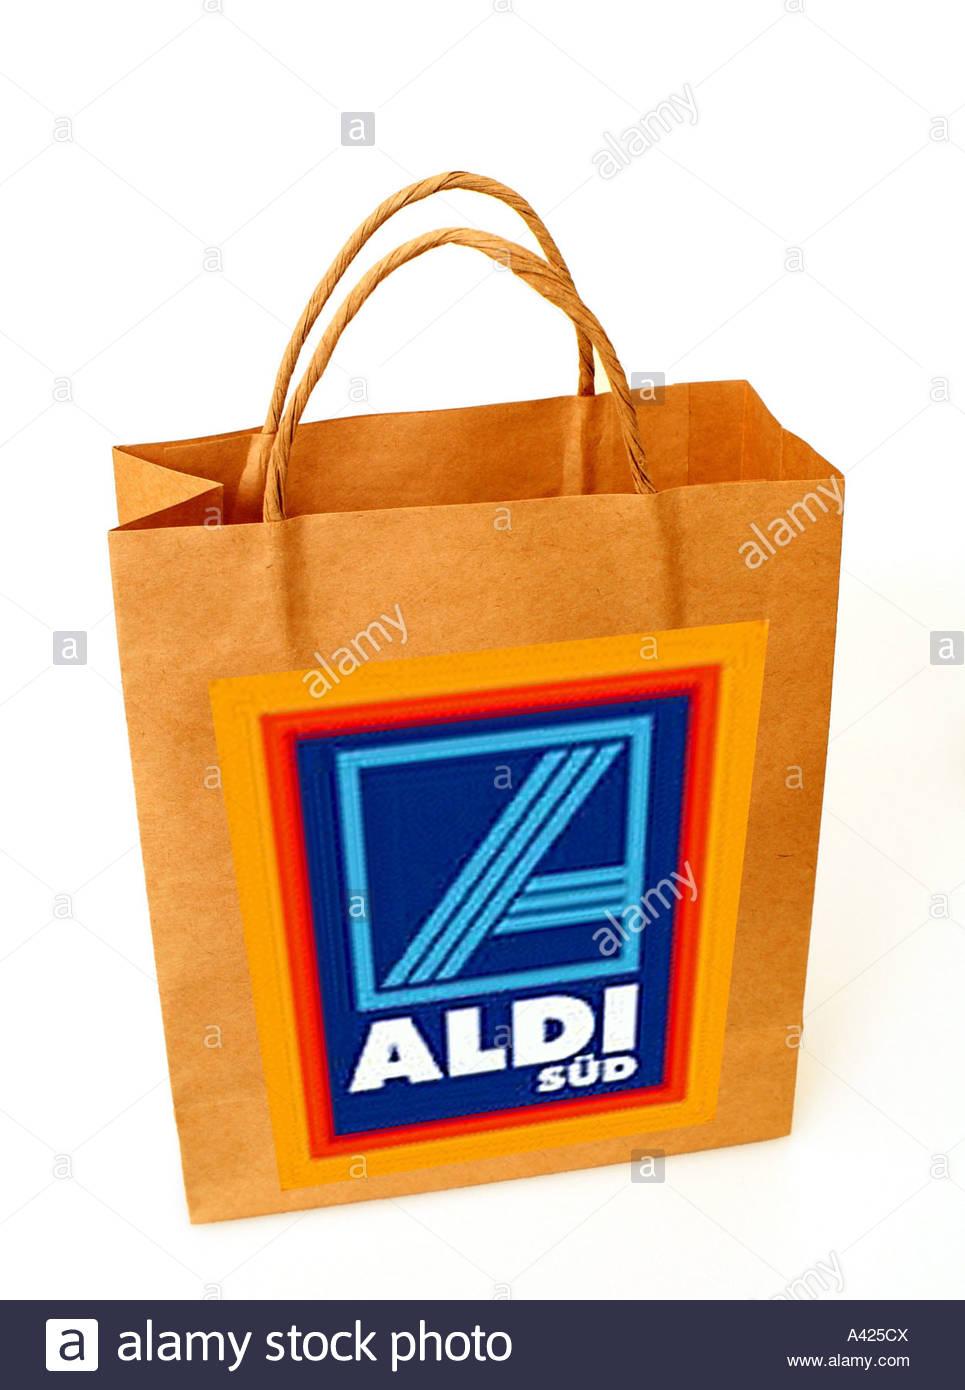 aldi shopping bag stock photos aldi shopping bag stock images alamy. Black Bedroom Furniture Sets. Home Design Ideas